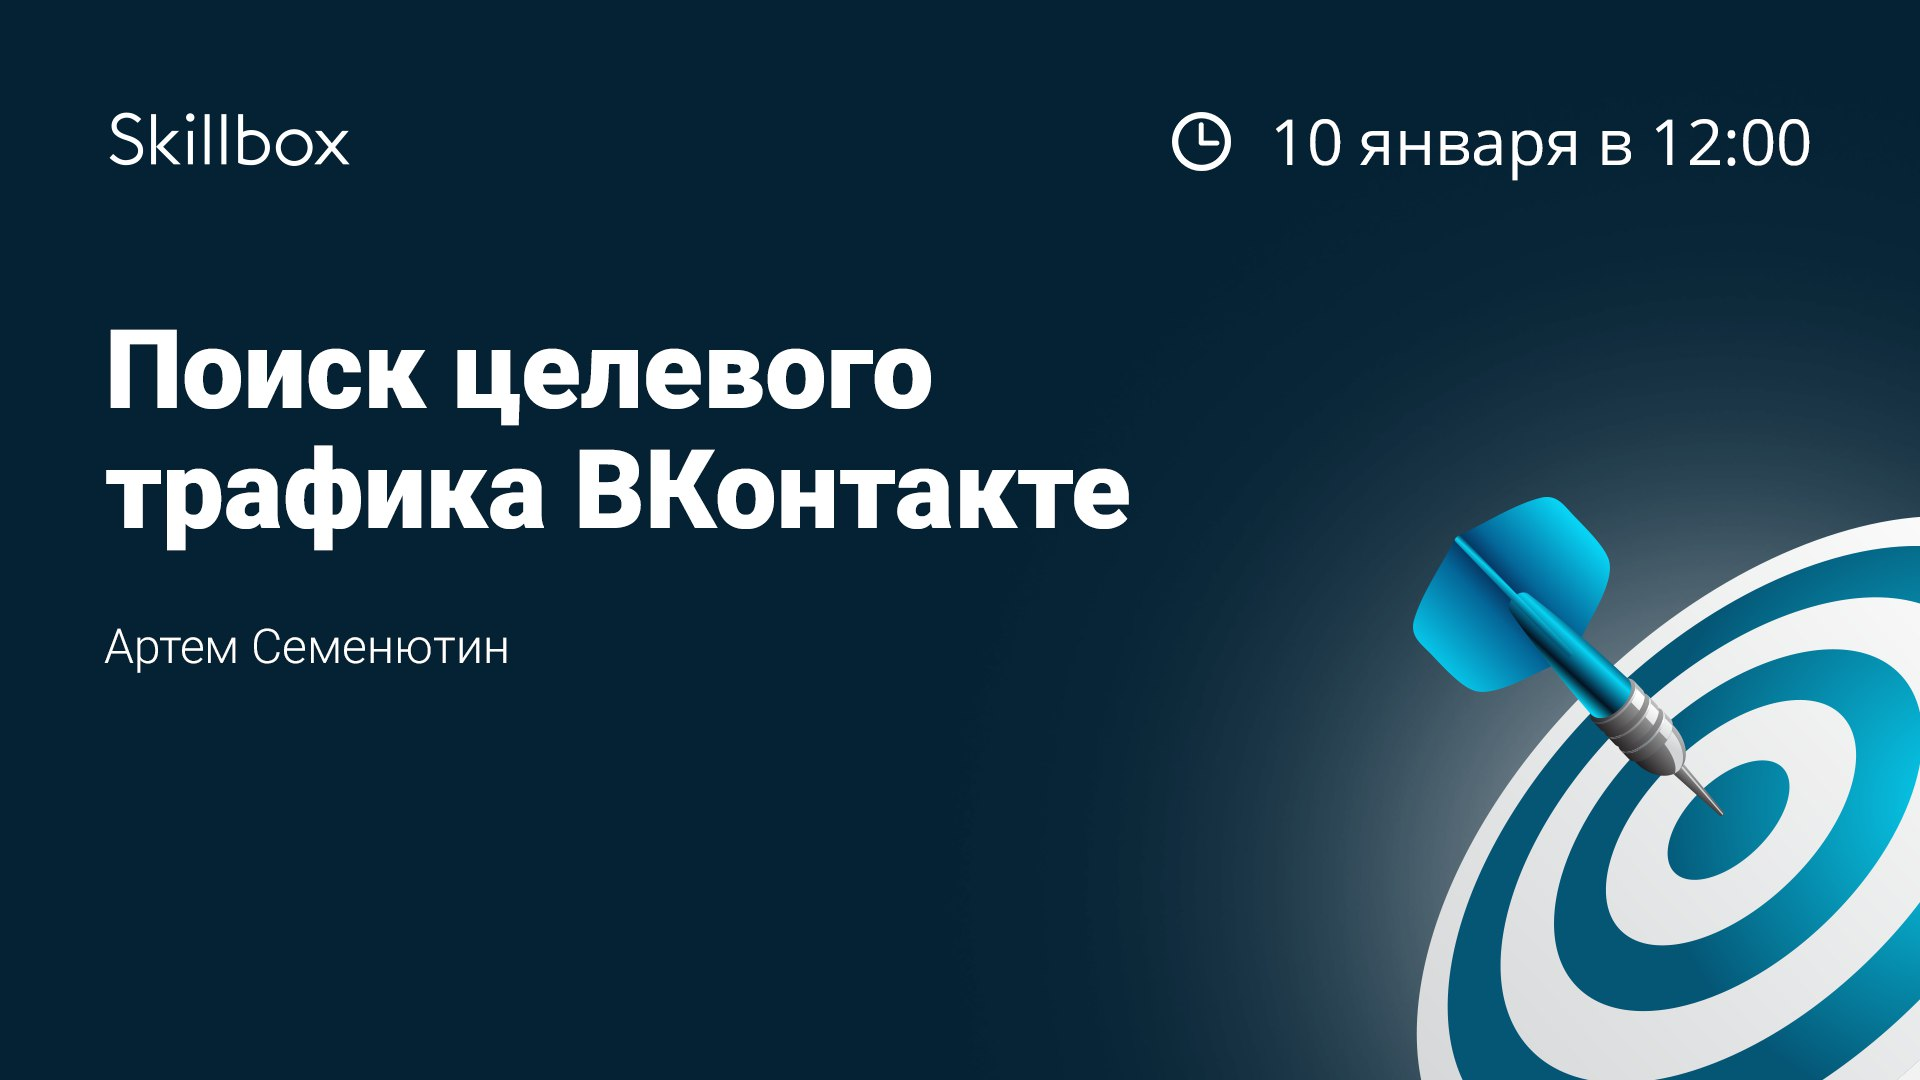 Поиск целевого трафика ВКонтакте - Семенютин.jpg